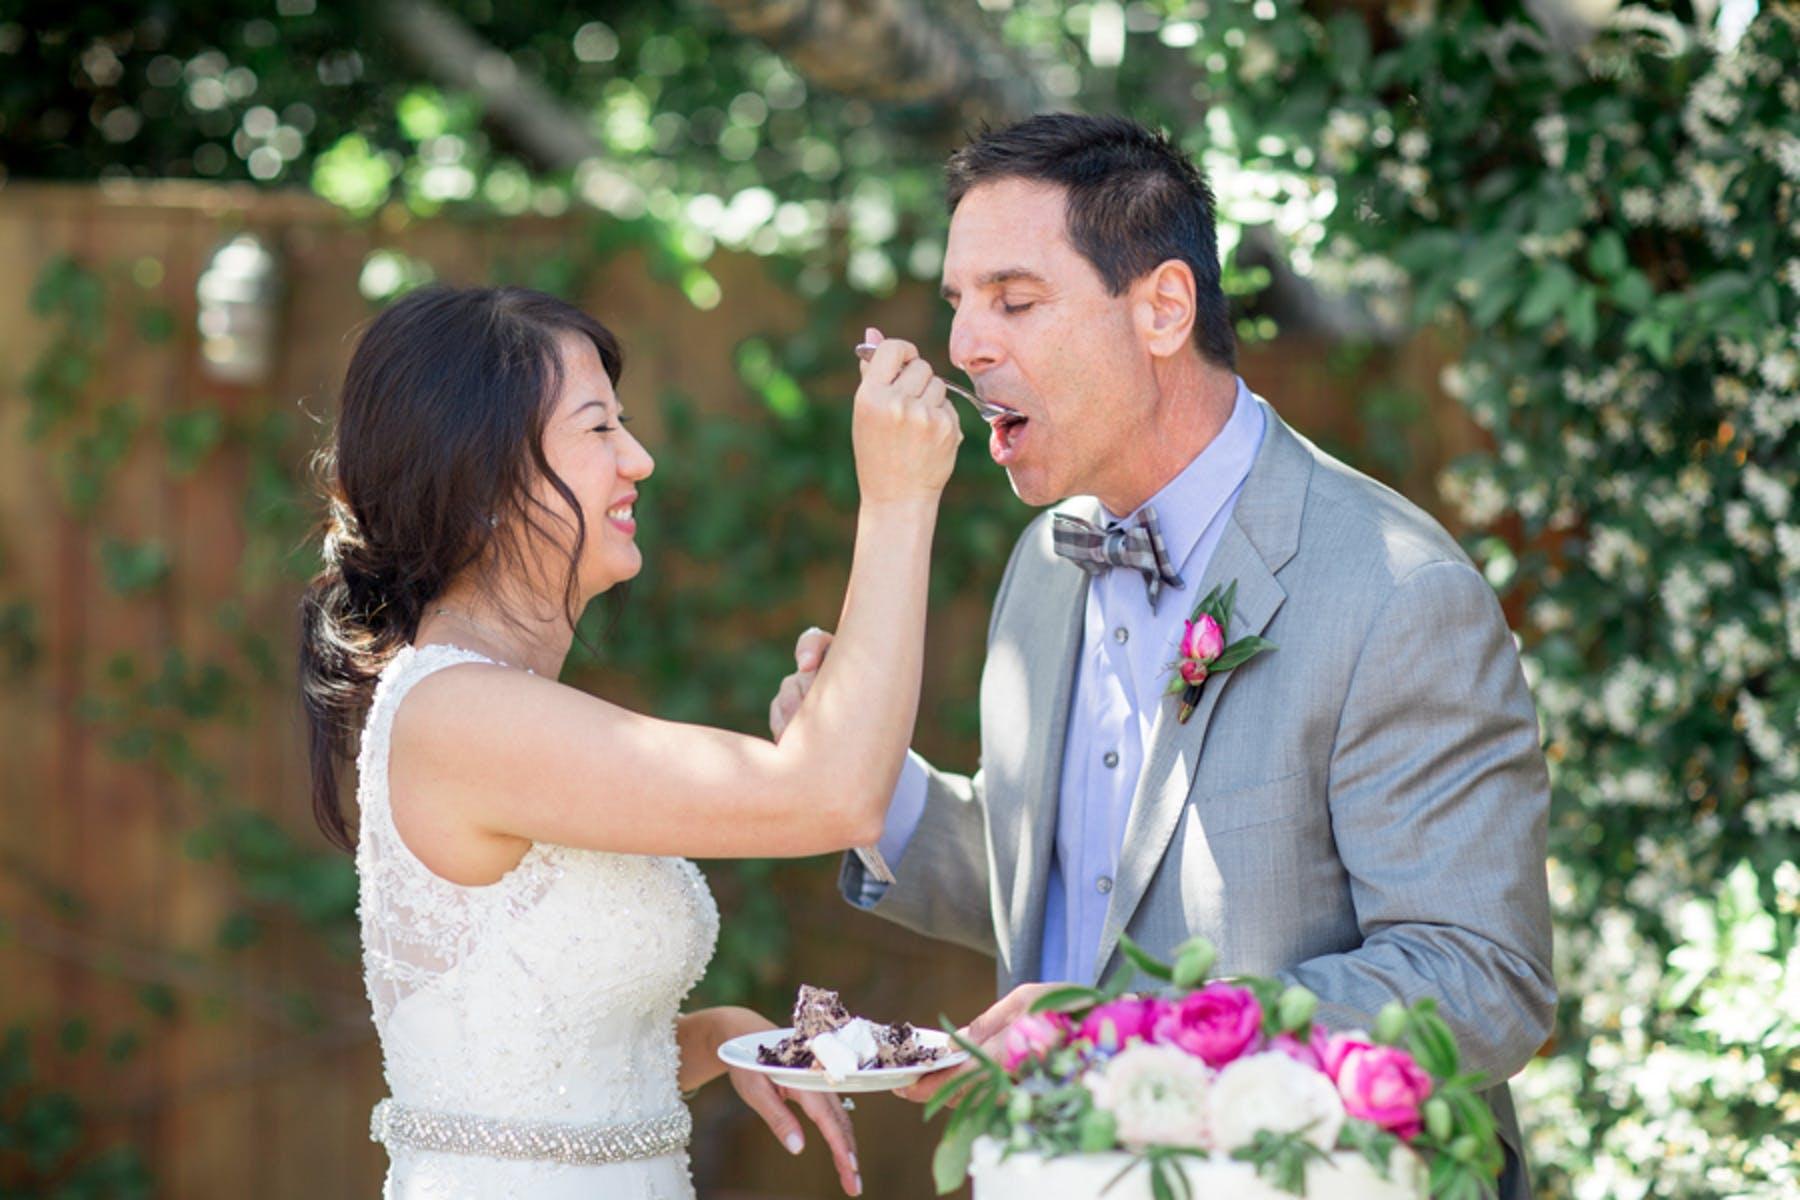 www.santabarbarawedding.com | Michael + Anna Costa Photography | San Ysidro Ranch | Twine Events | Bride and Groom Eat Cake